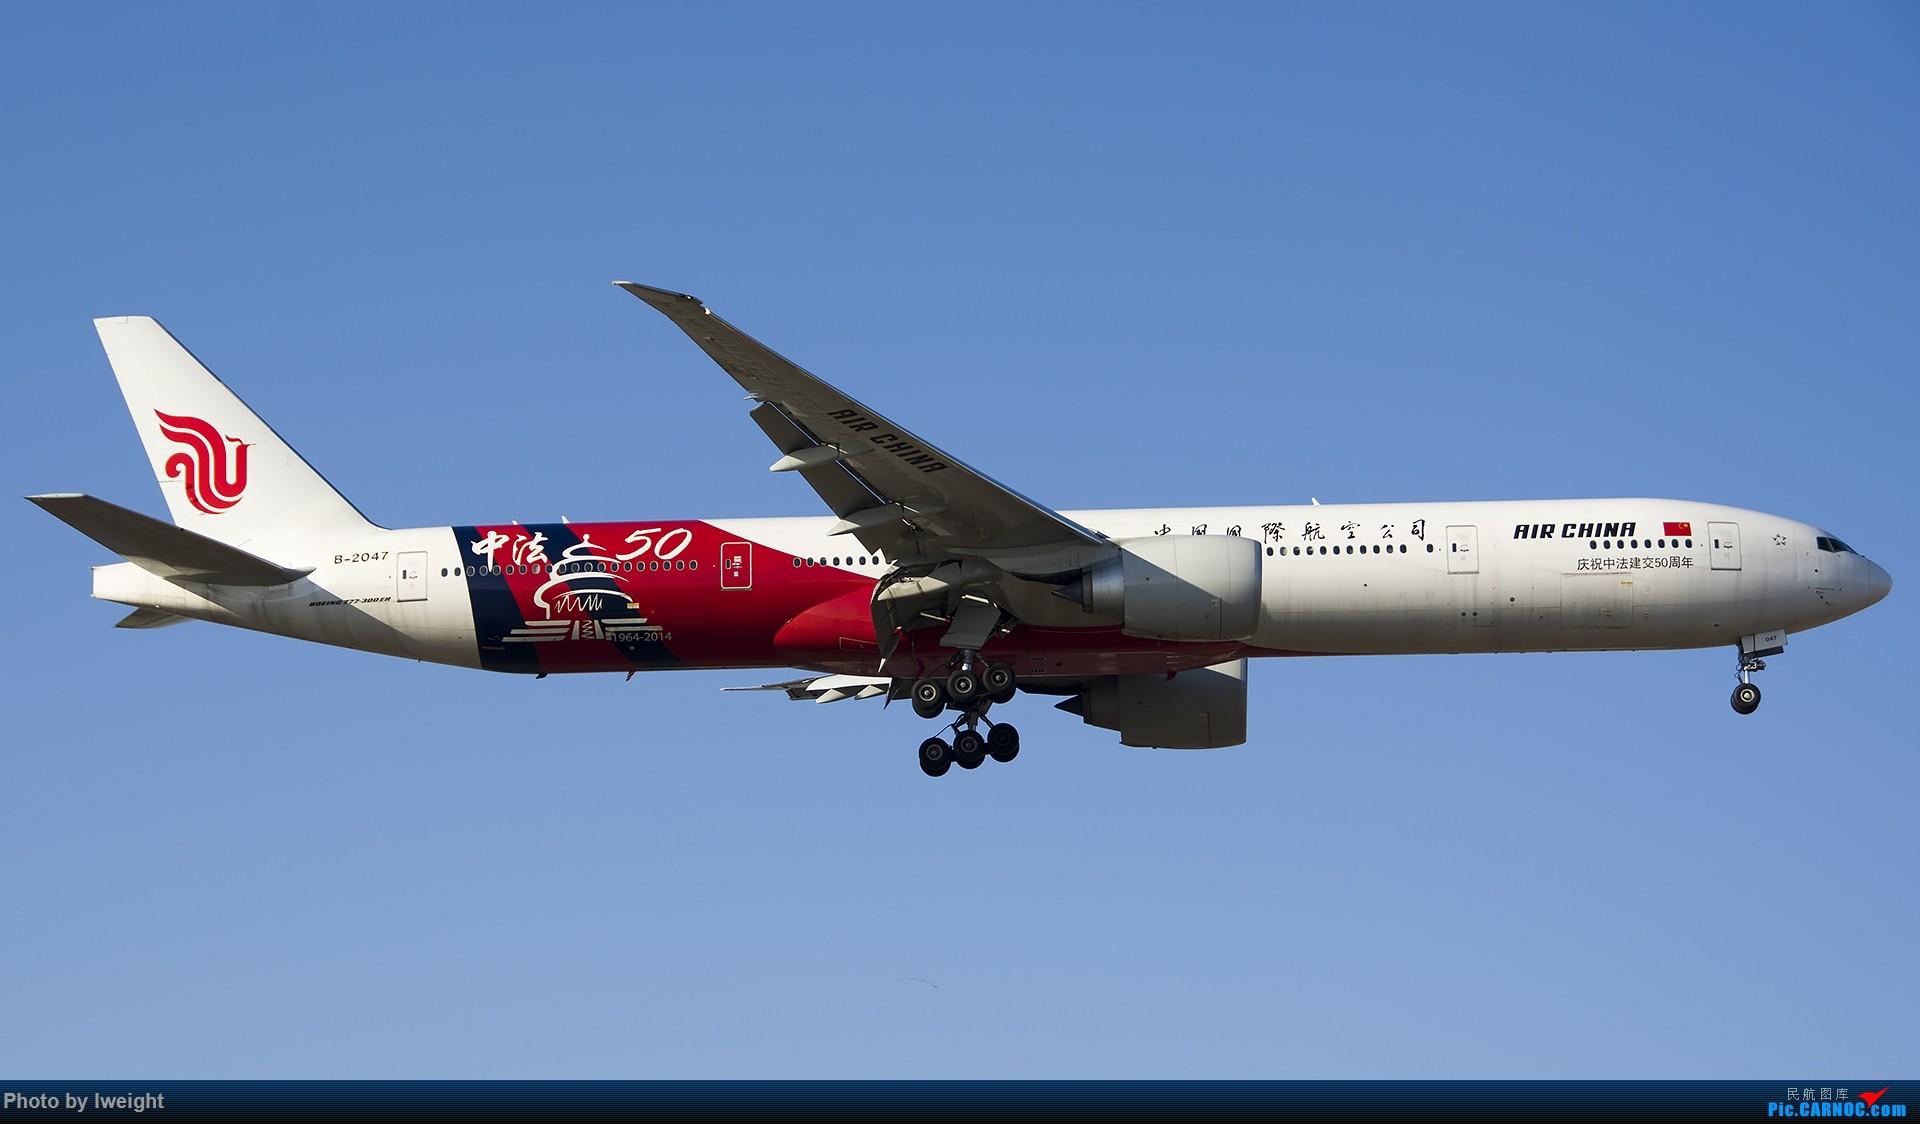 Re:[原创]2014-12-06 PEK天气由好变坏的直接体验 BOEING 777-300ER B-2047 中国北京首都国际机场